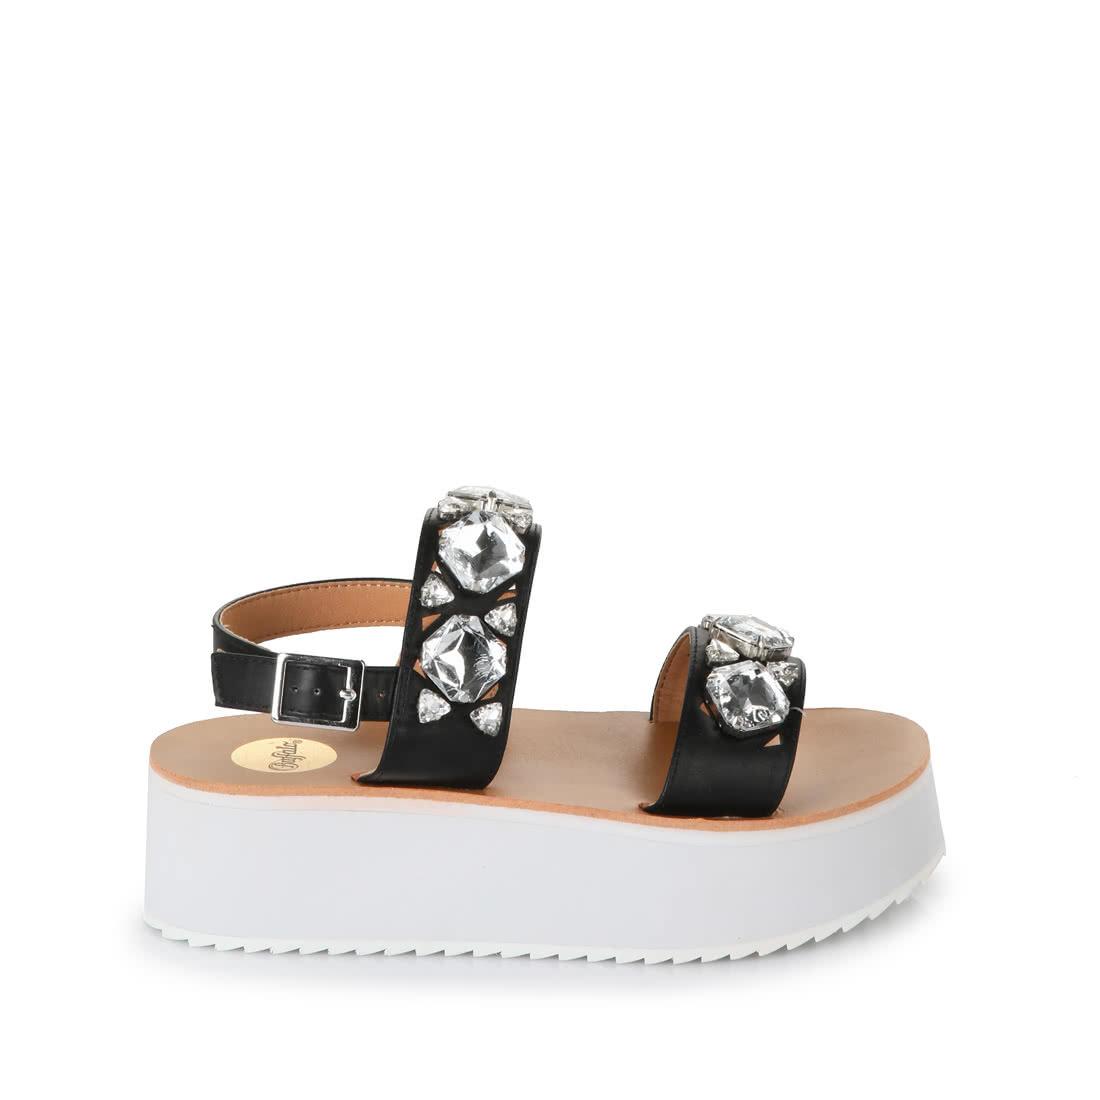 6e98709ad9c7 Buffalo platform sandals with gemstones buy online in BUFFALO Online ...